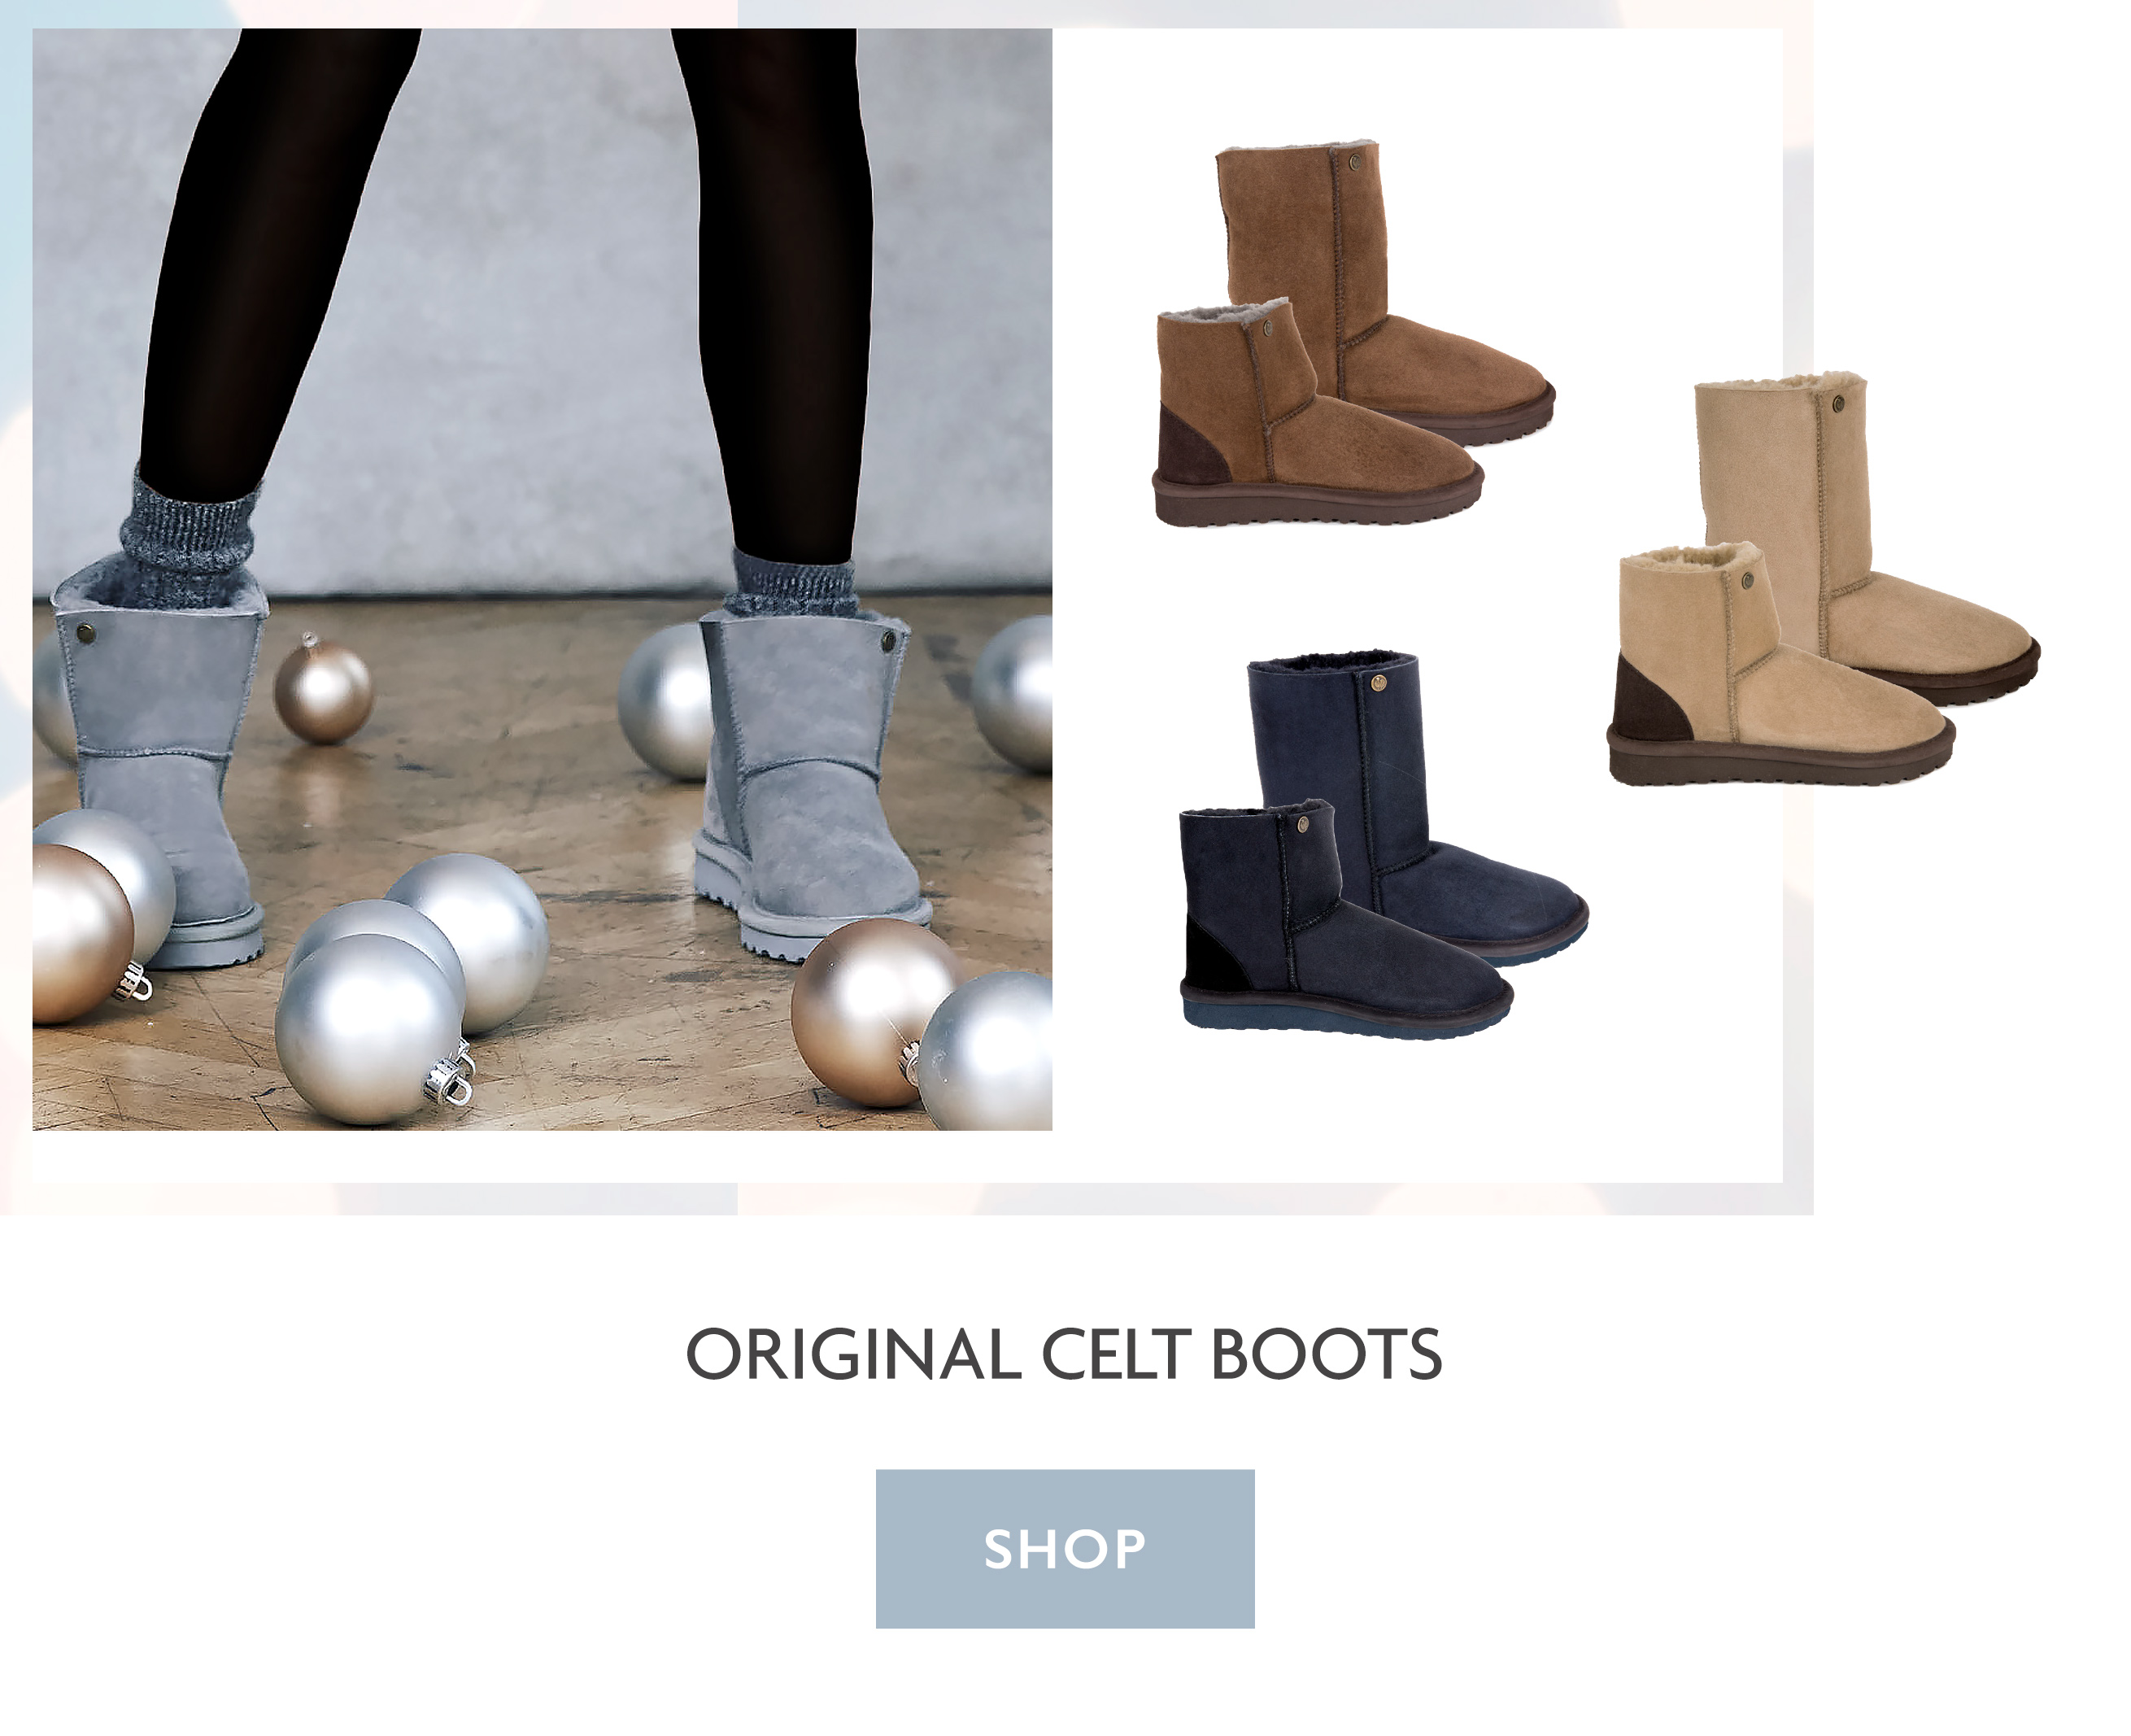 raw-celts.jpg